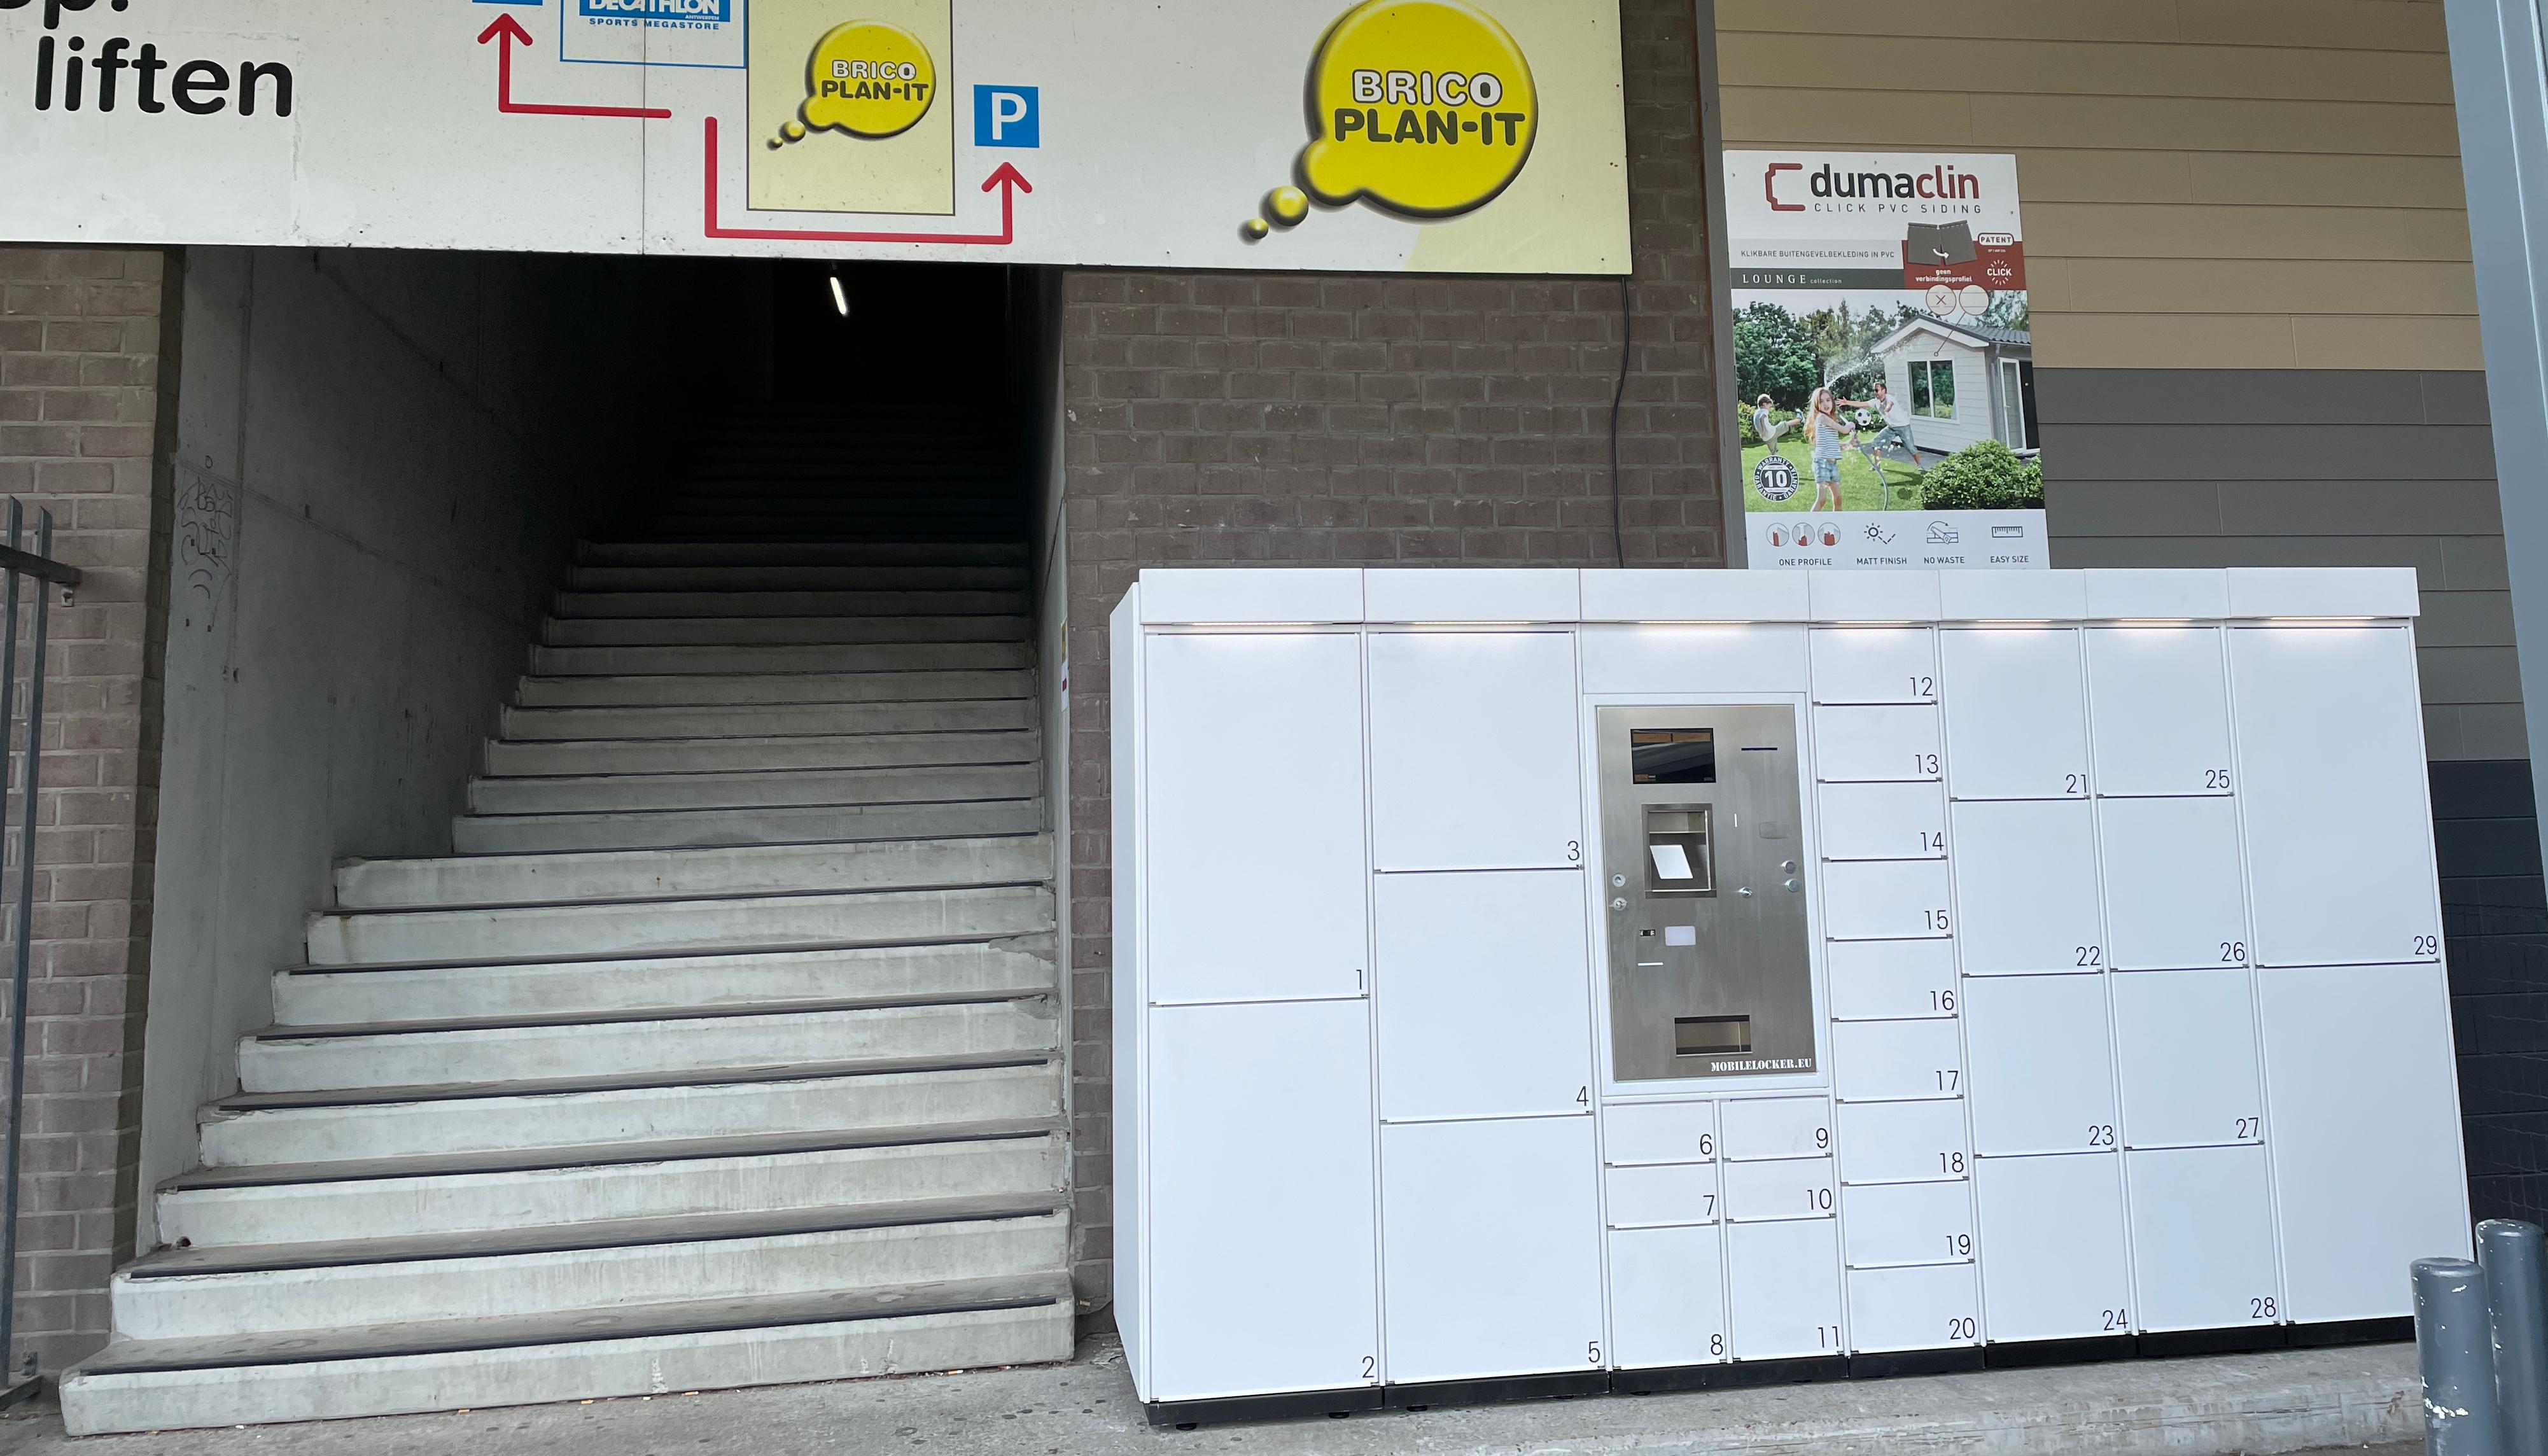 City of Antwerp, Brico & Collibree lockers